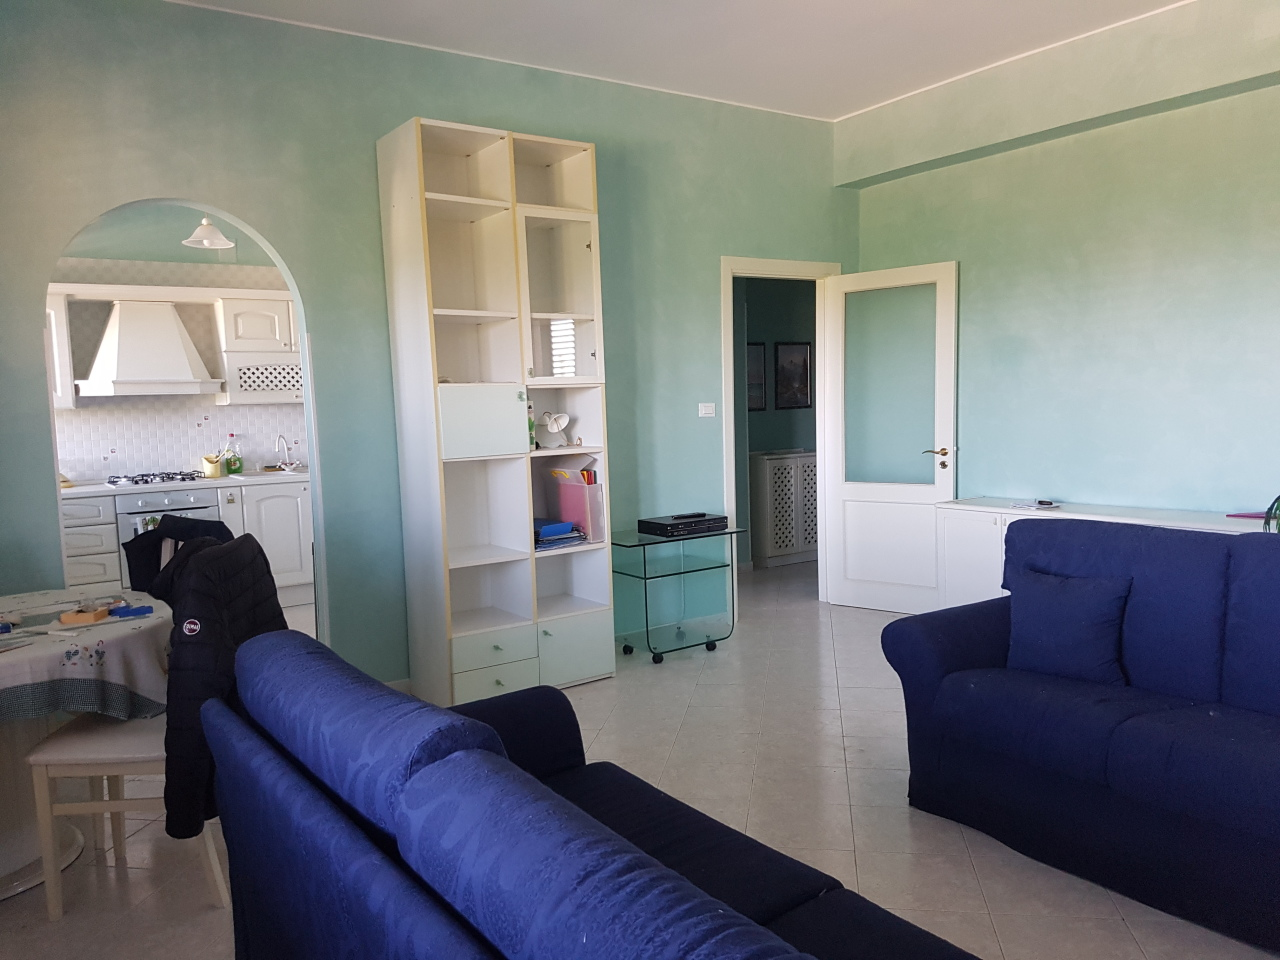 Appartamento - Quadrilocale a Isola Sacramento, Siracusa